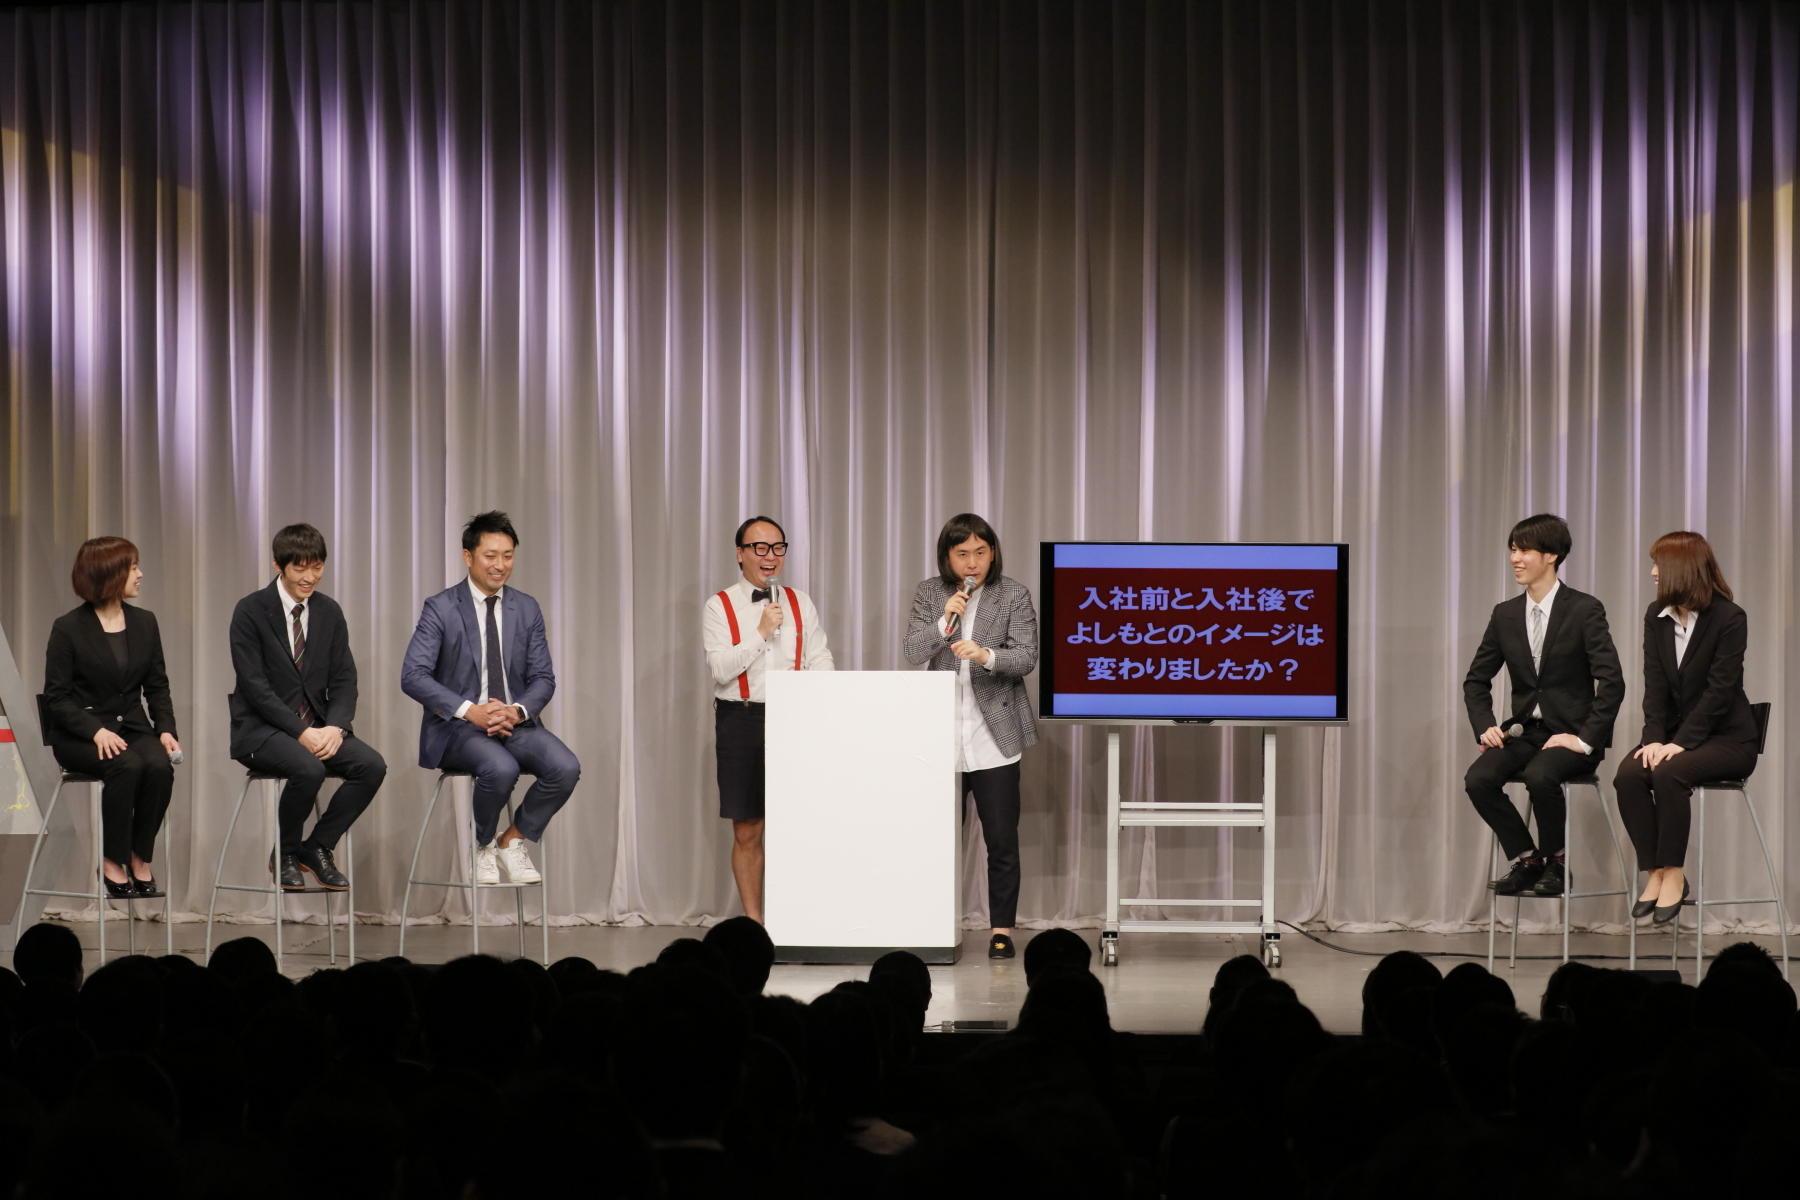 http://news.yoshimoto.co.jp/20180314164420-f4473b4f017d273fcbe2a43dbe1bf12f3f555a90.jpg